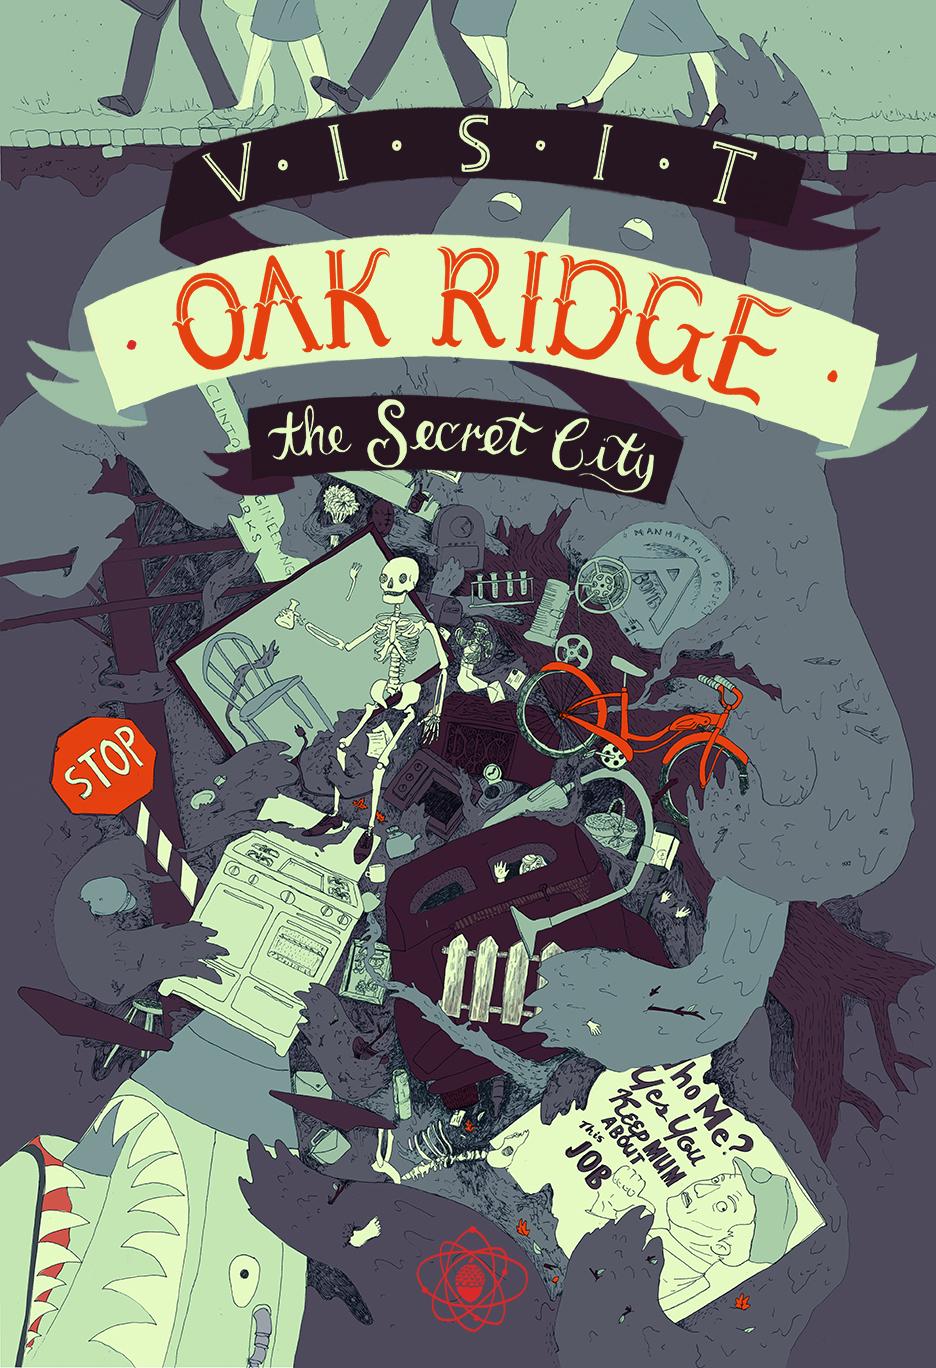 visit-oak-ridge-the-secret-city-clare-freeman-illustrator.jpg